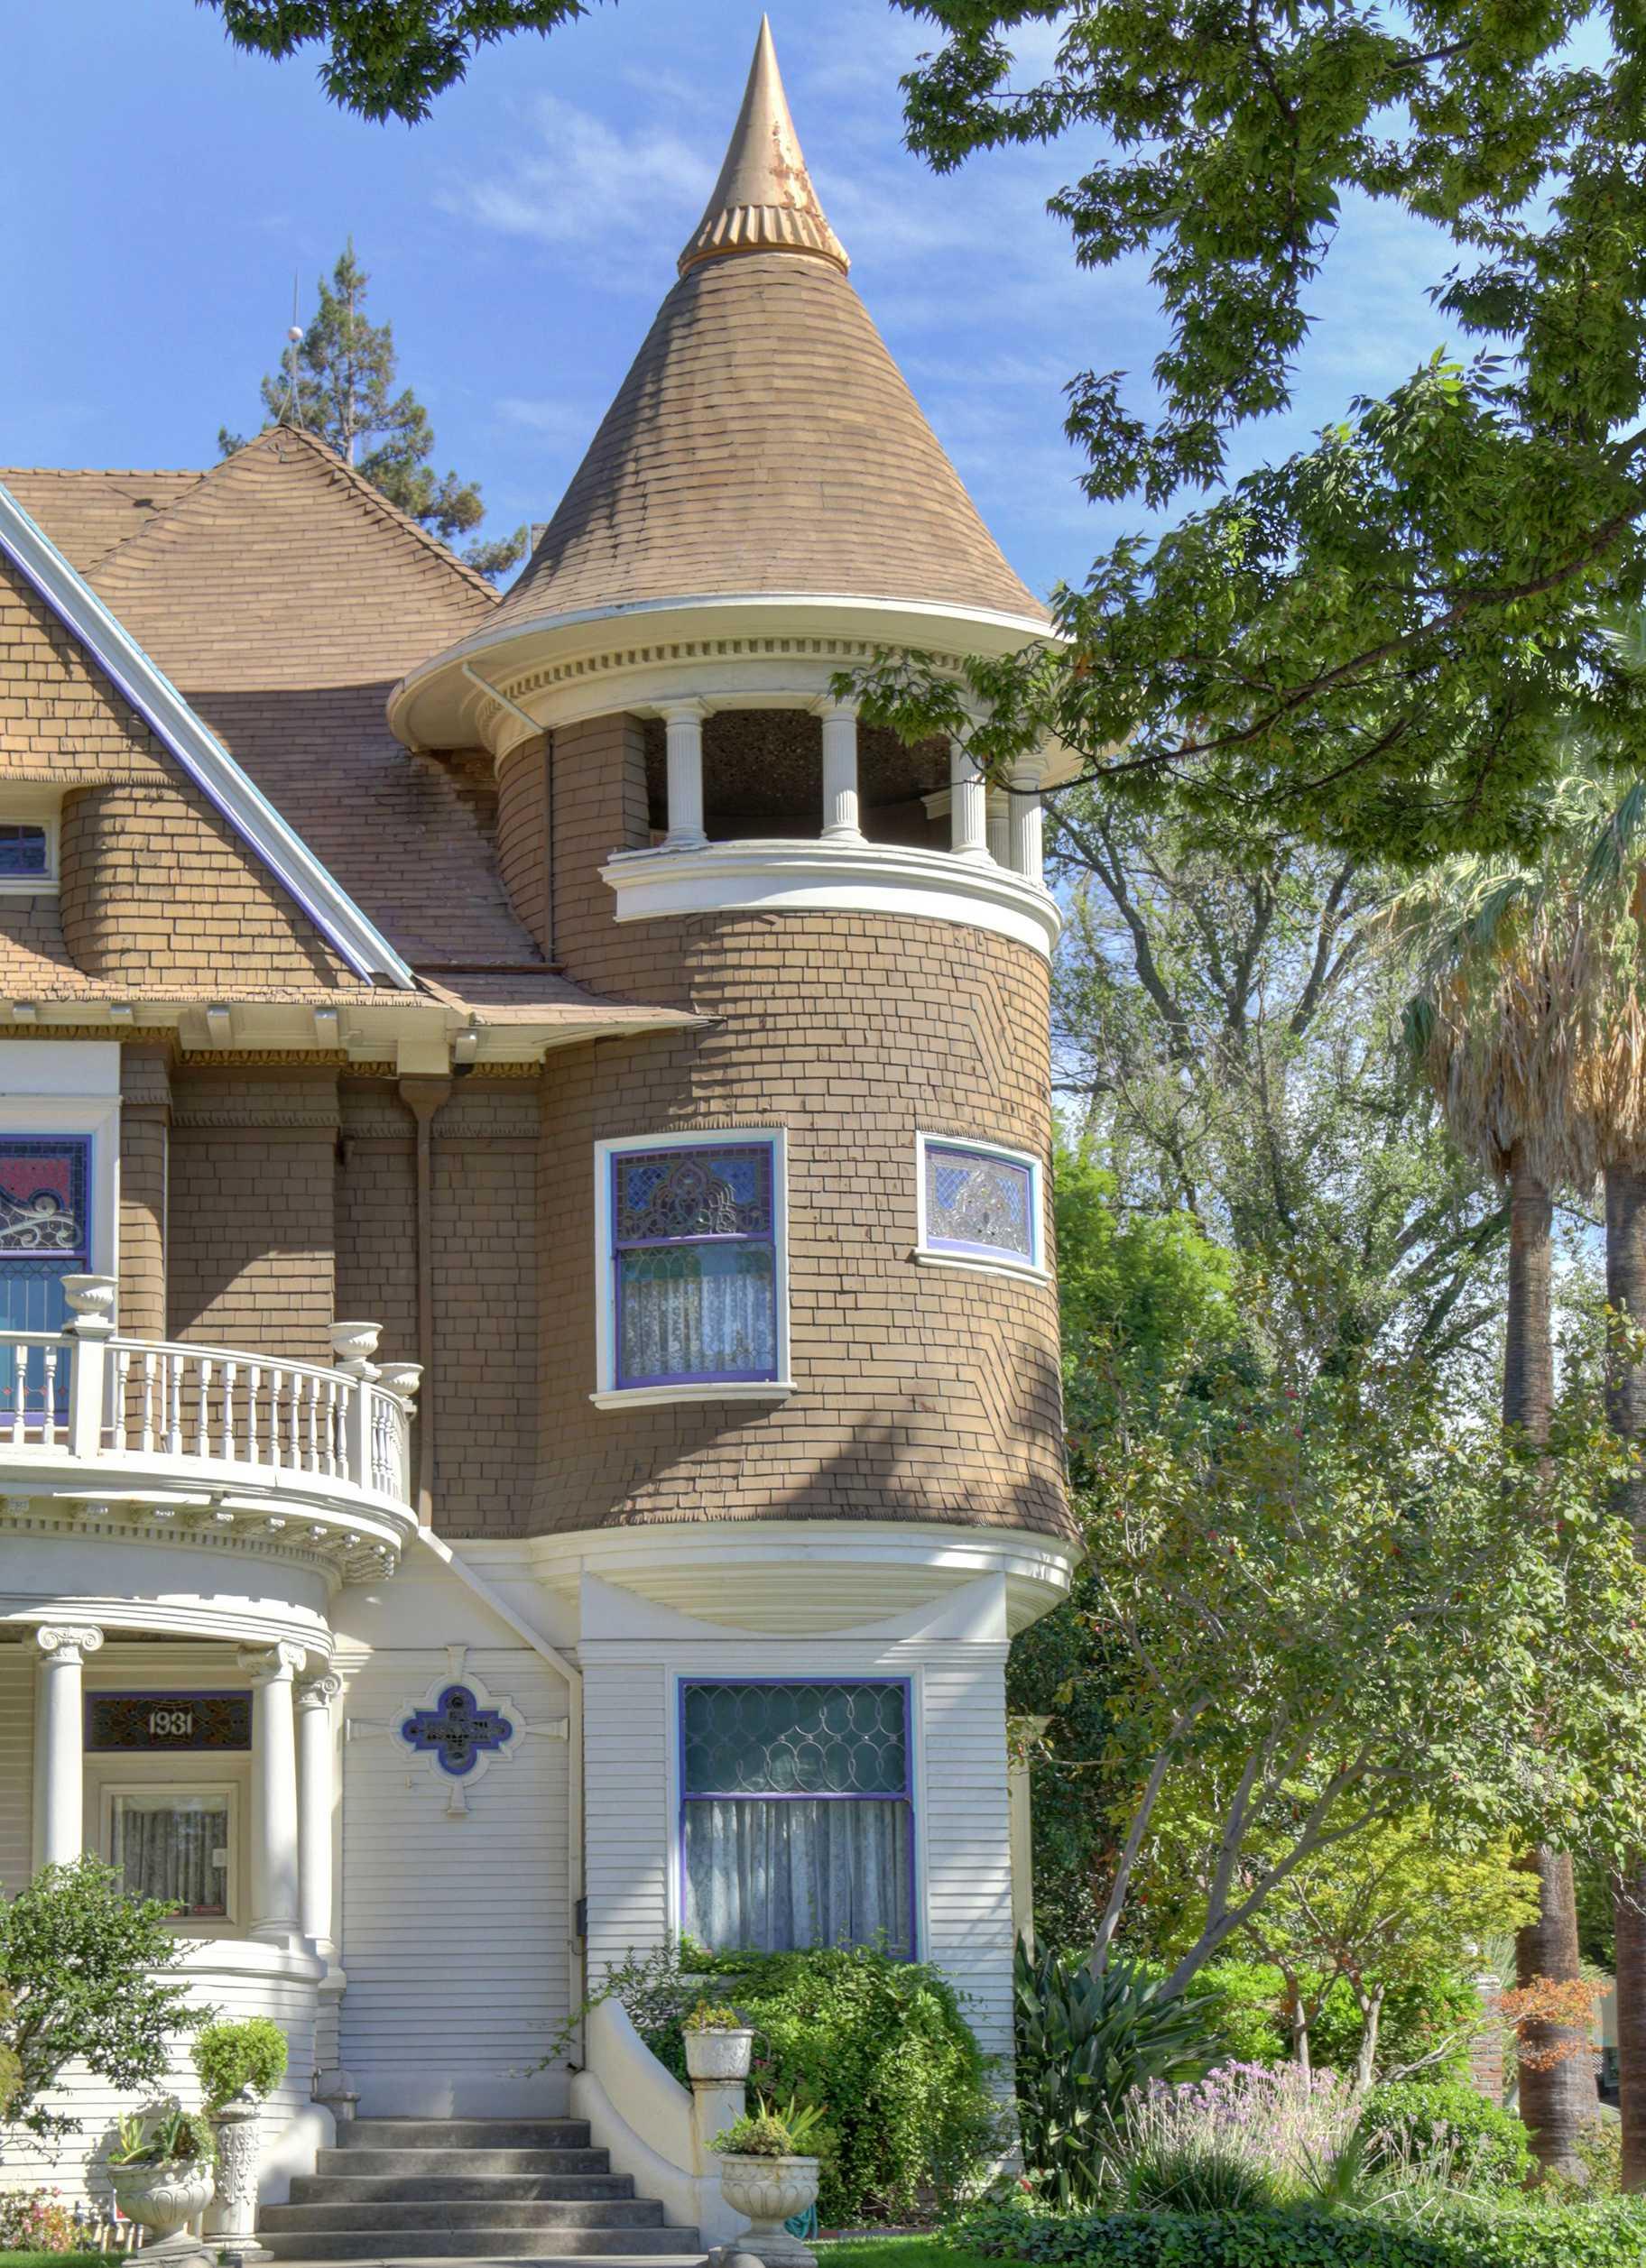 Sacramento Victorian mansion turret